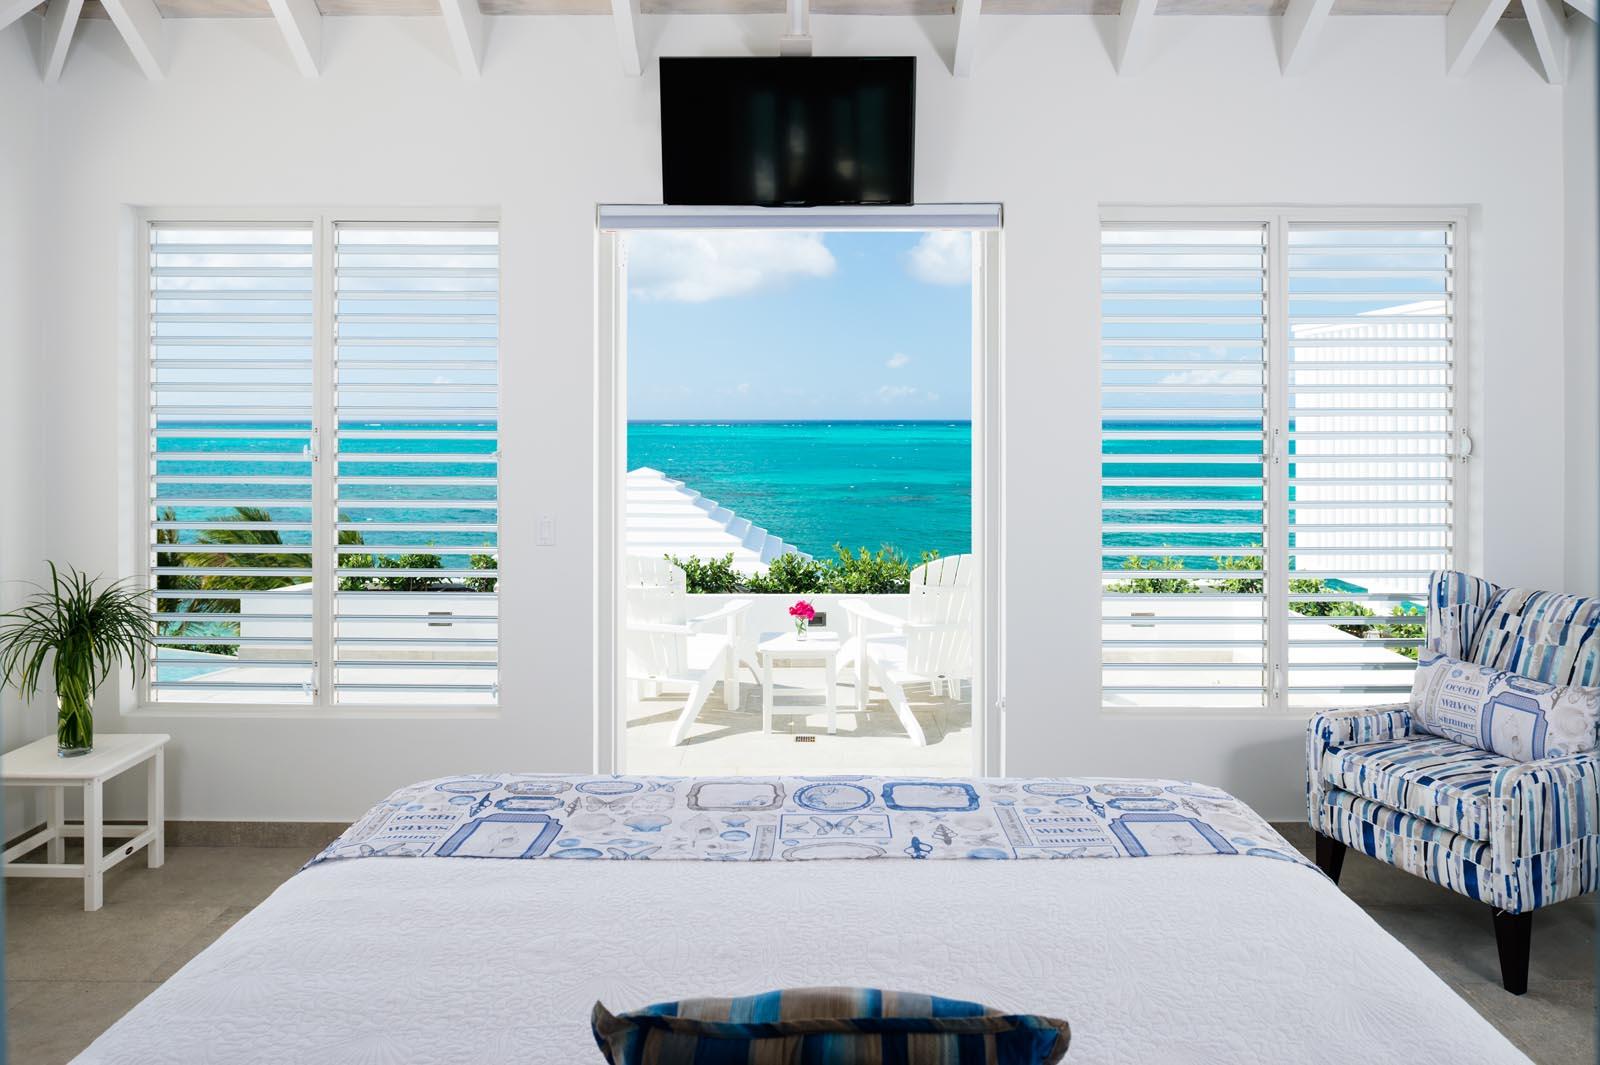 All 6 master bedroom suites have a private patio or balcony at villa Villa Cascade, Babalua Beach, Providenciales (Provo), Turks and Caicos Islands.